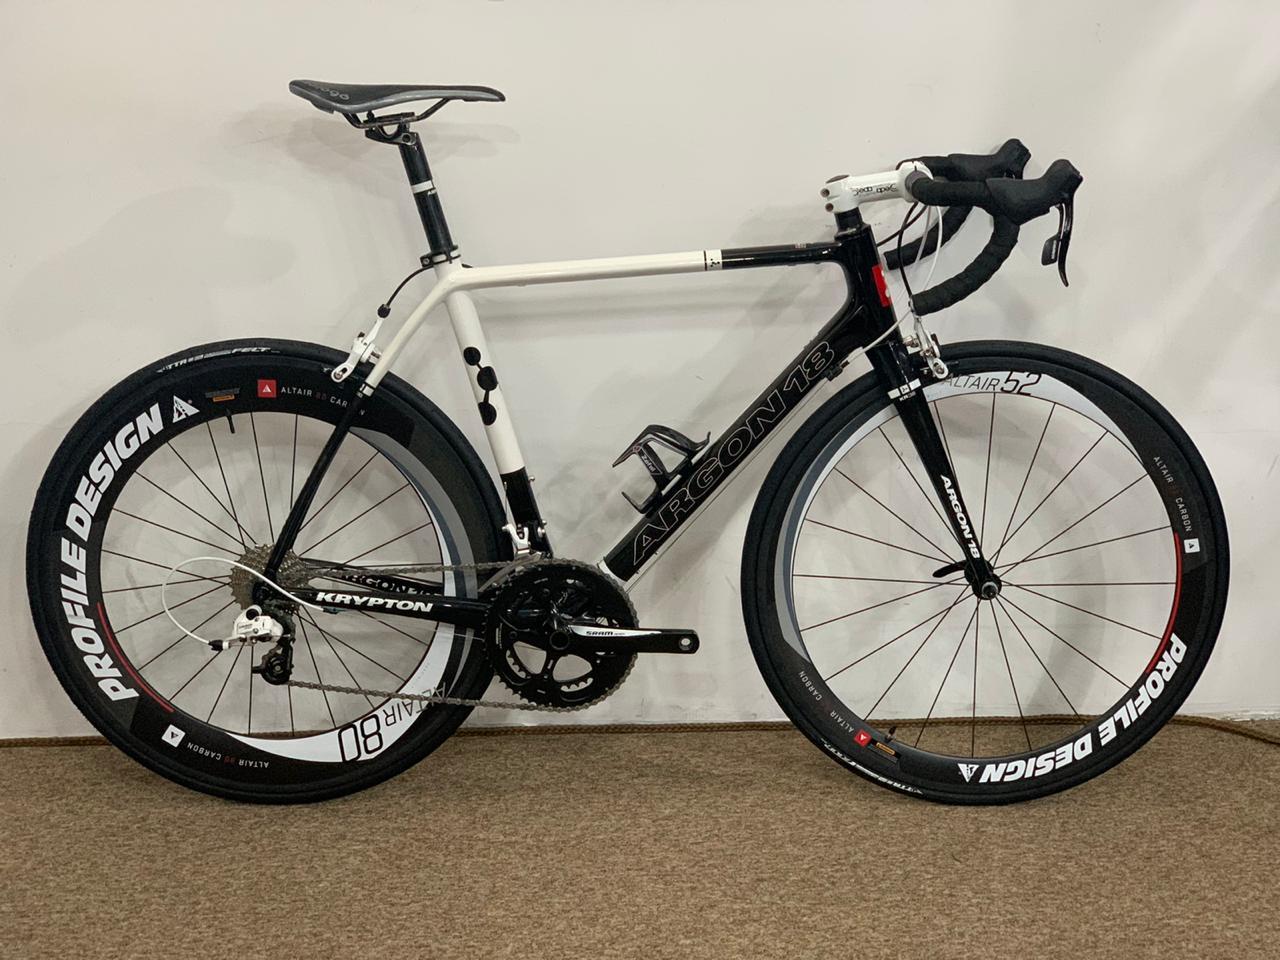 Bicicleta Speed Argon 18 Krypton 54 Sram Apex 10v